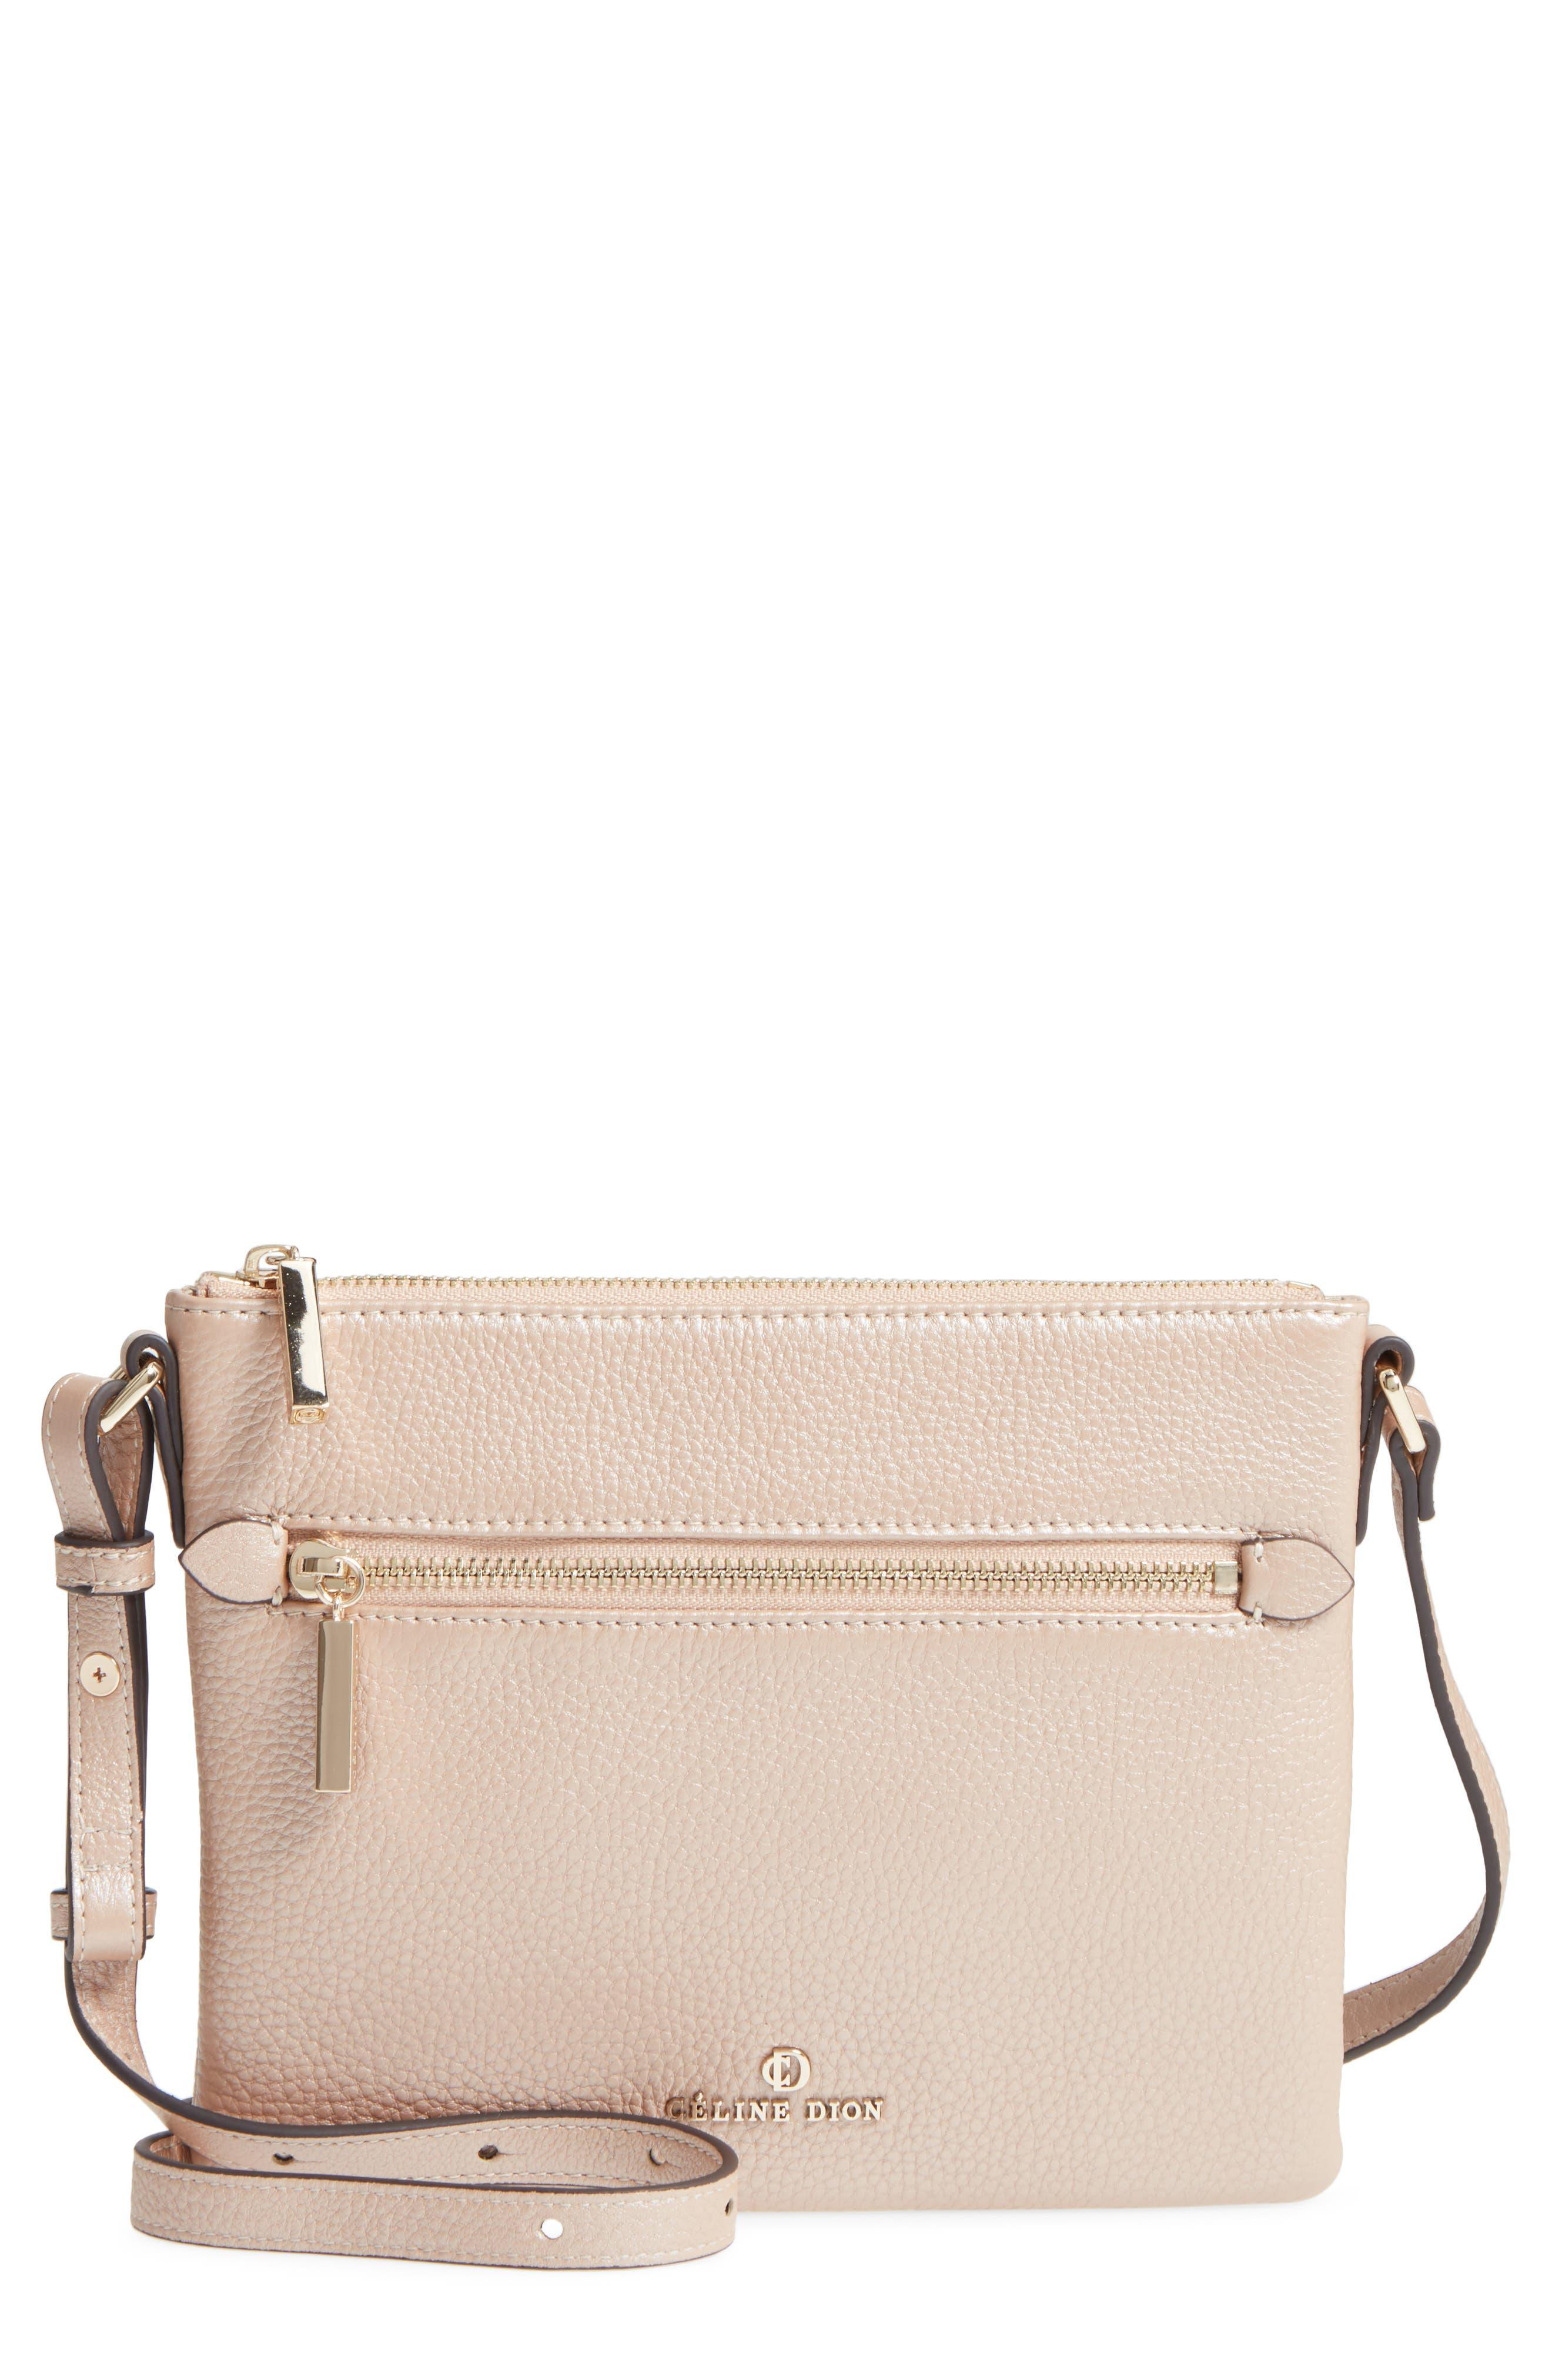 Céline Dion Adagio Leather Crossbody Bag,                             Main thumbnail 1, color,                             Rose Gold